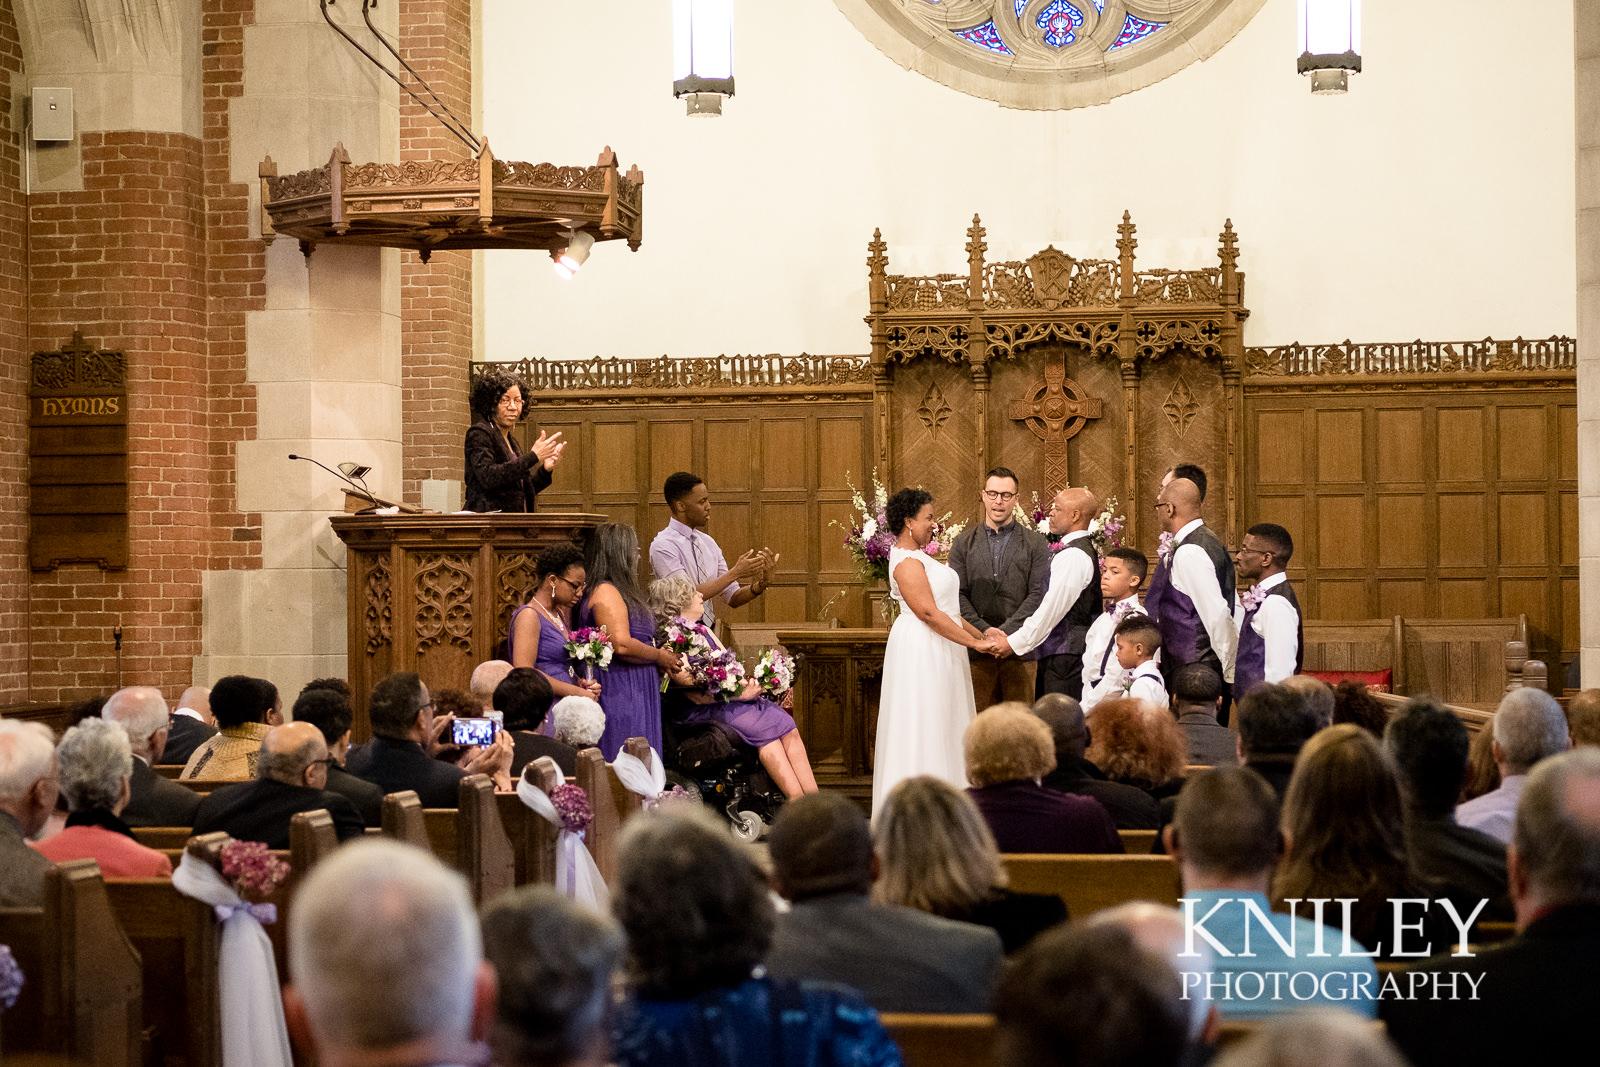 Rochester Colgate Divinity School Wedding - Classic Rochester NY Wedding - 021-XT2B4523.jpg